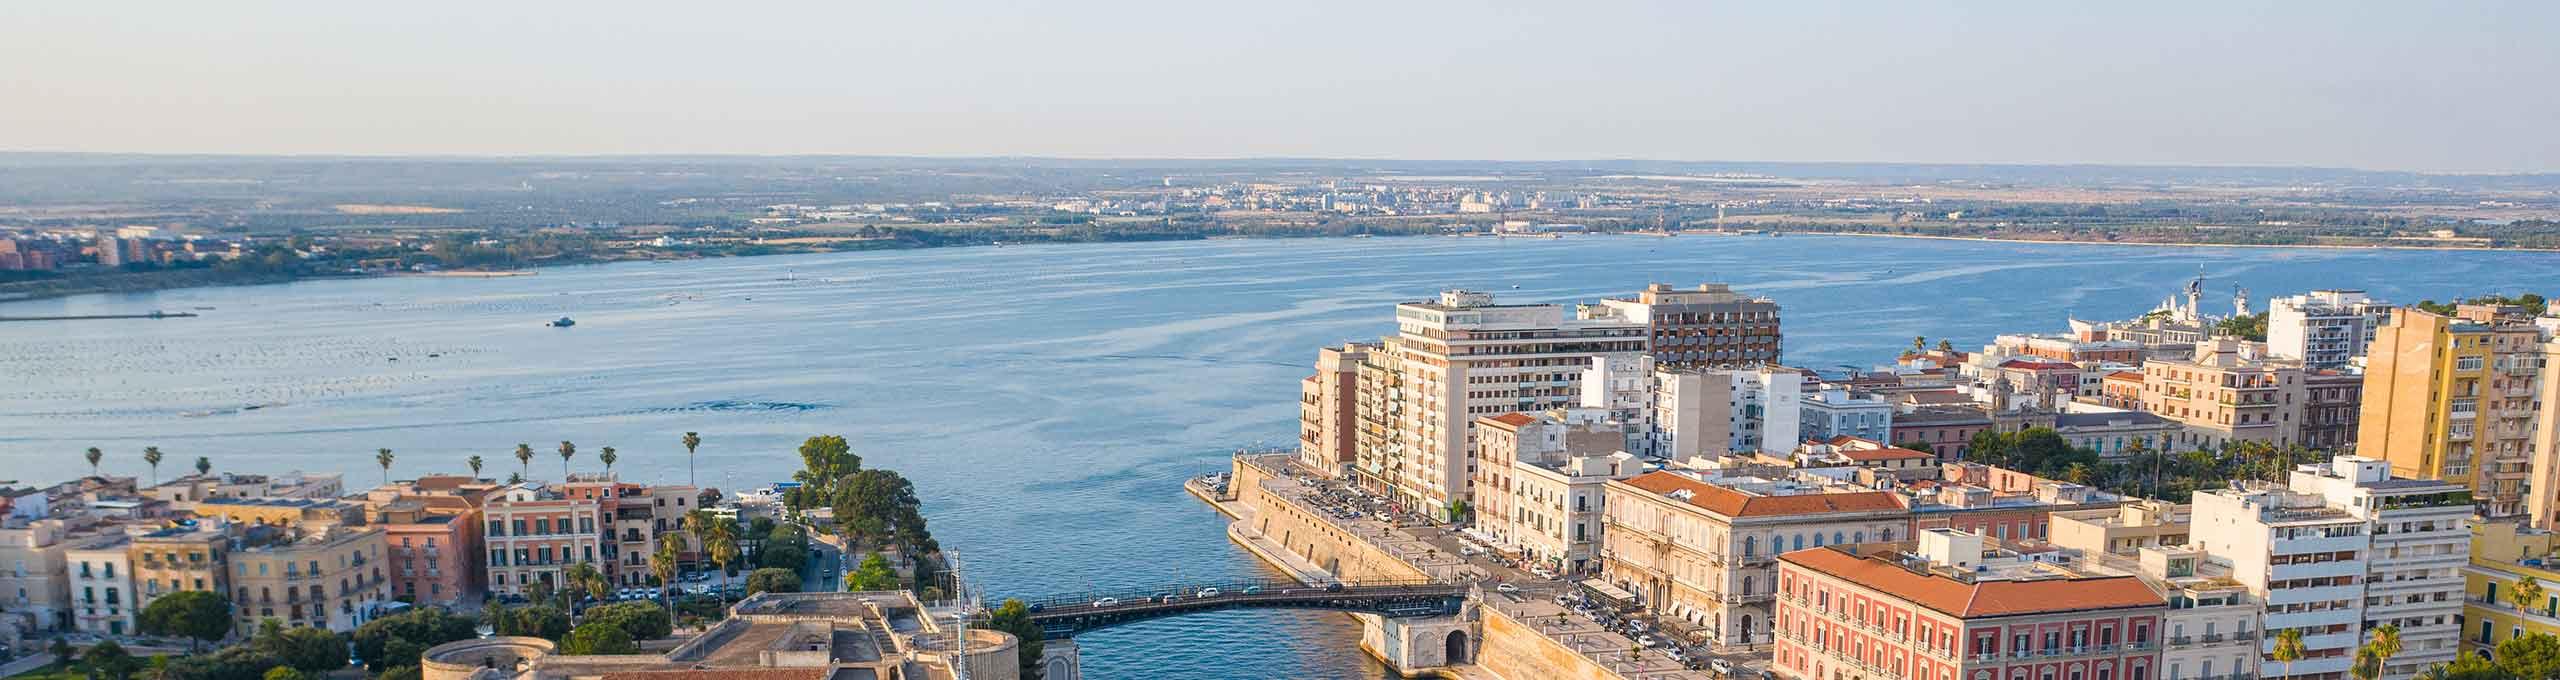 Taranto, vista sul porto